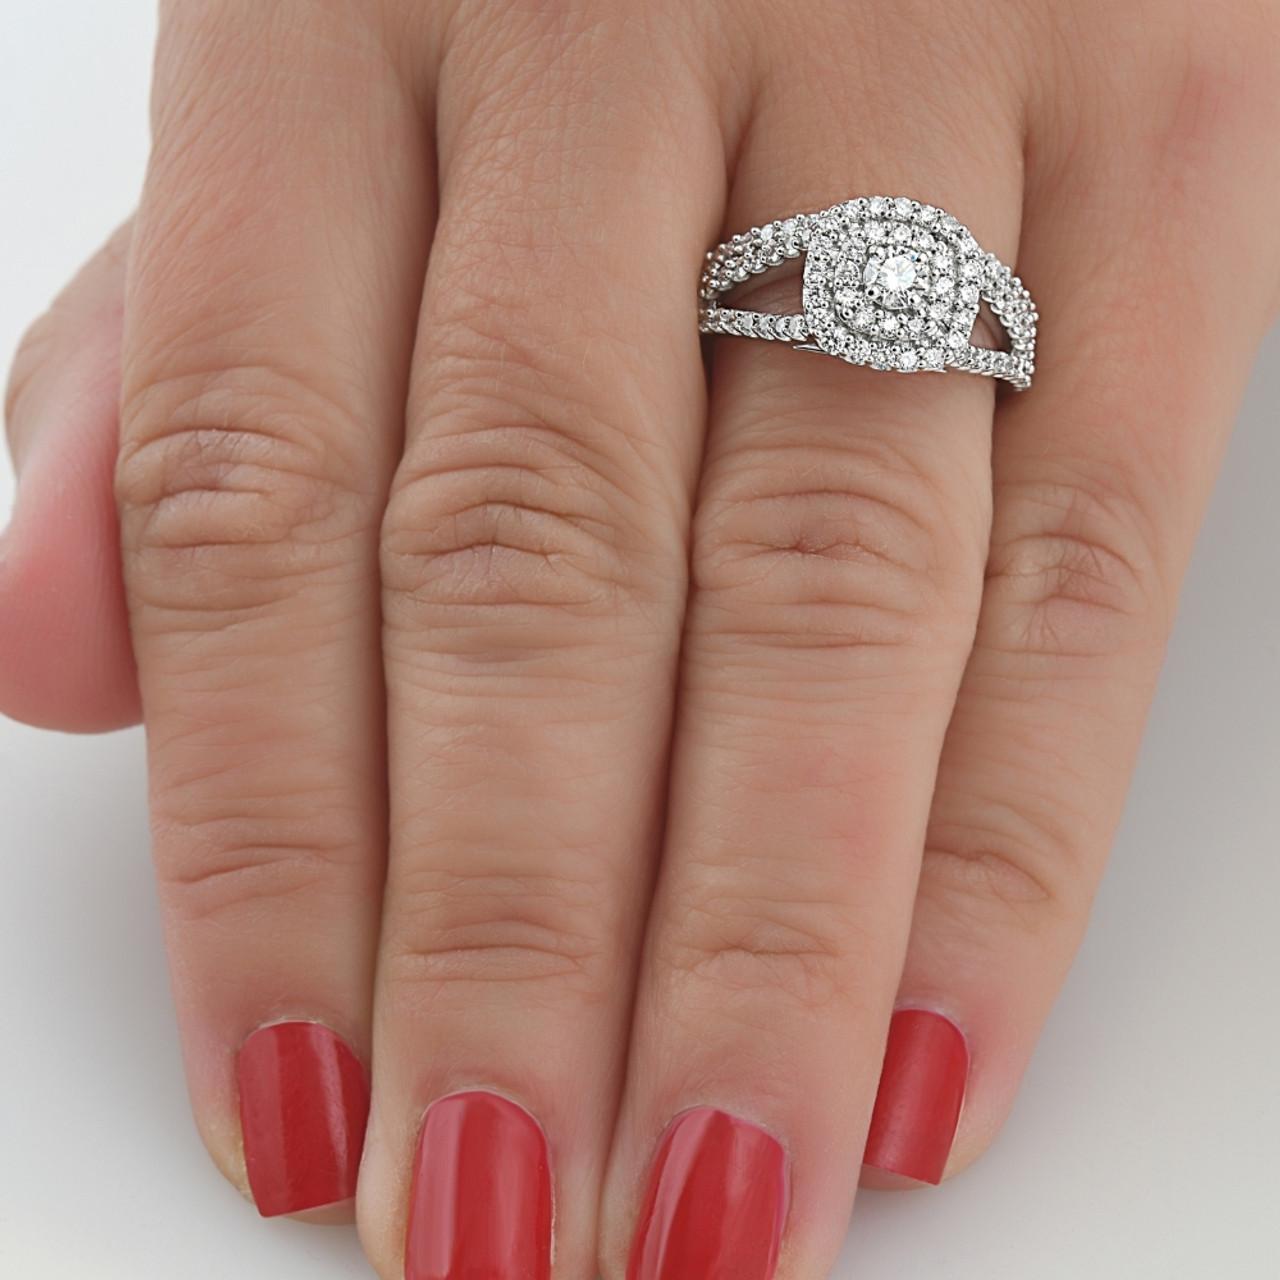 Diamond Wedding Band in 14K White Gold Size-3.75 1//10 cttw, G-H,I2-I3